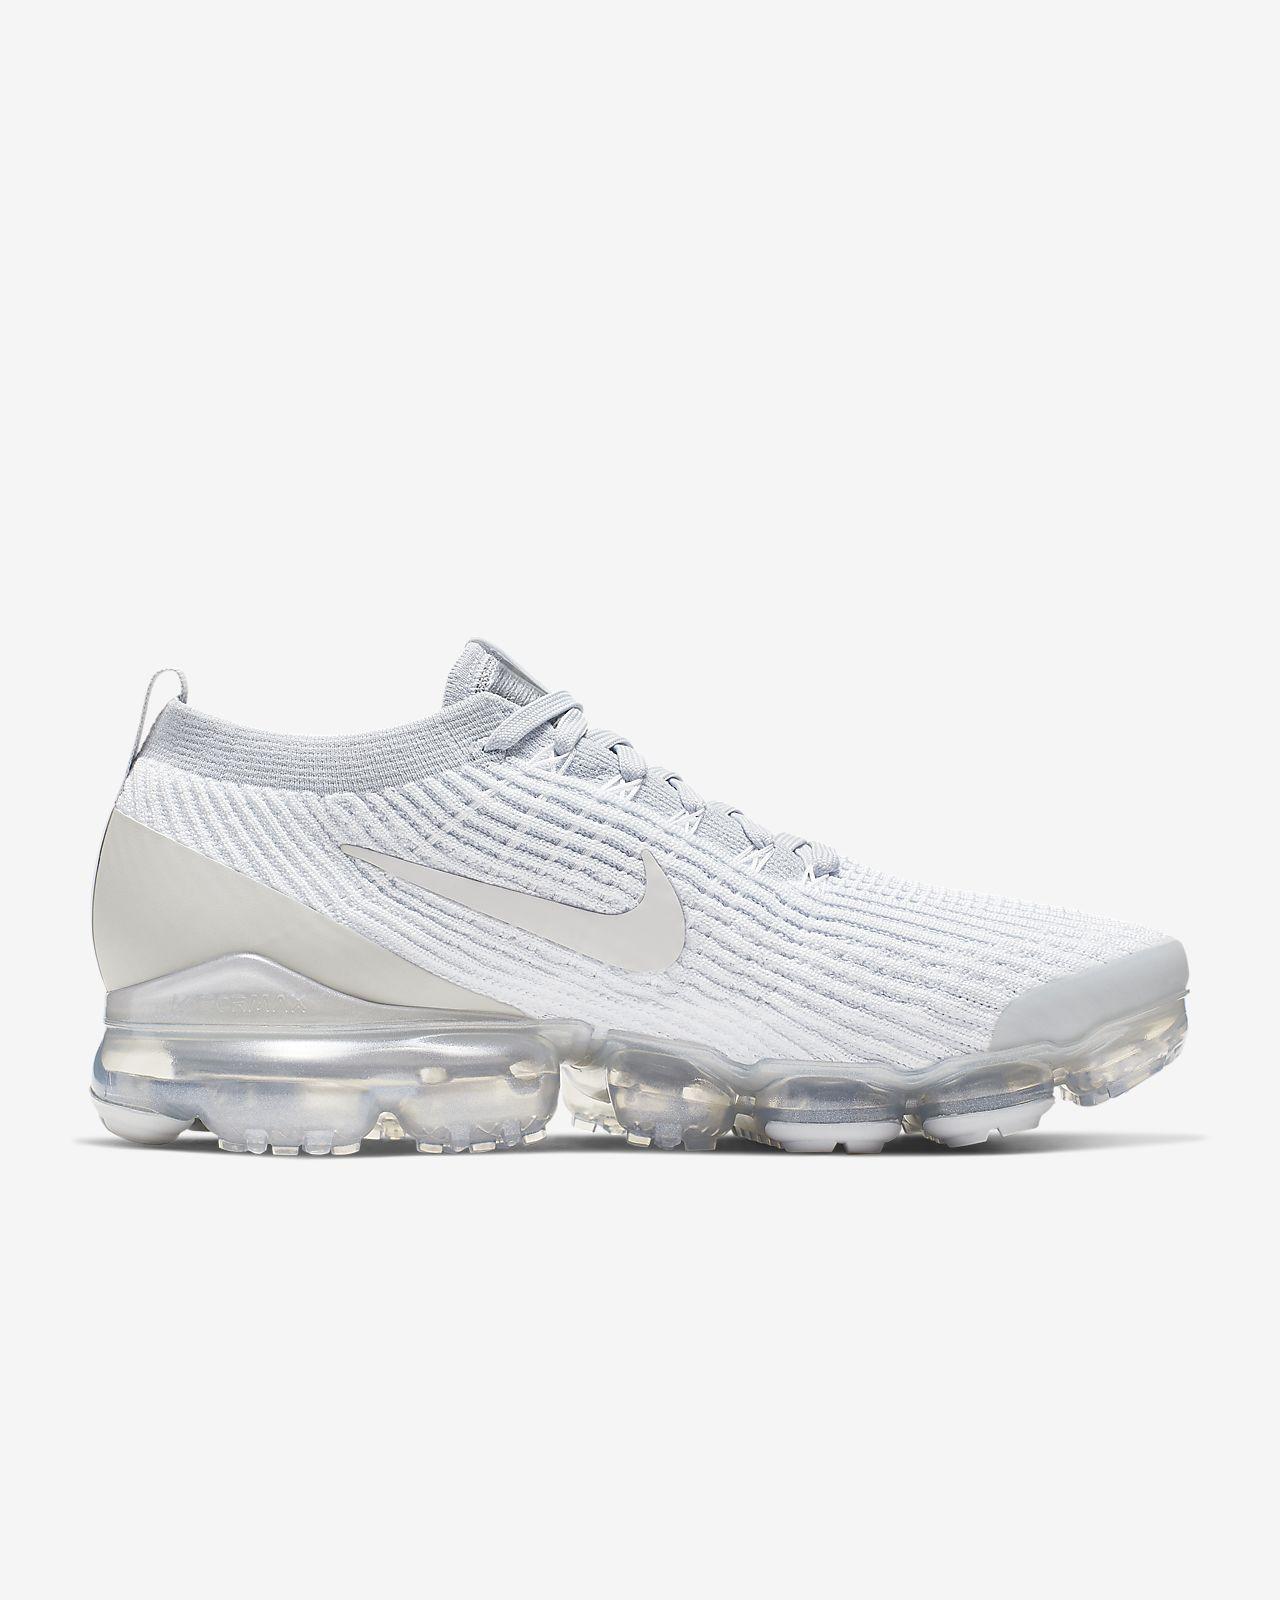 Air VaporMax Flyknit 3 Men's Shoe | Nike air vapormax, Nike